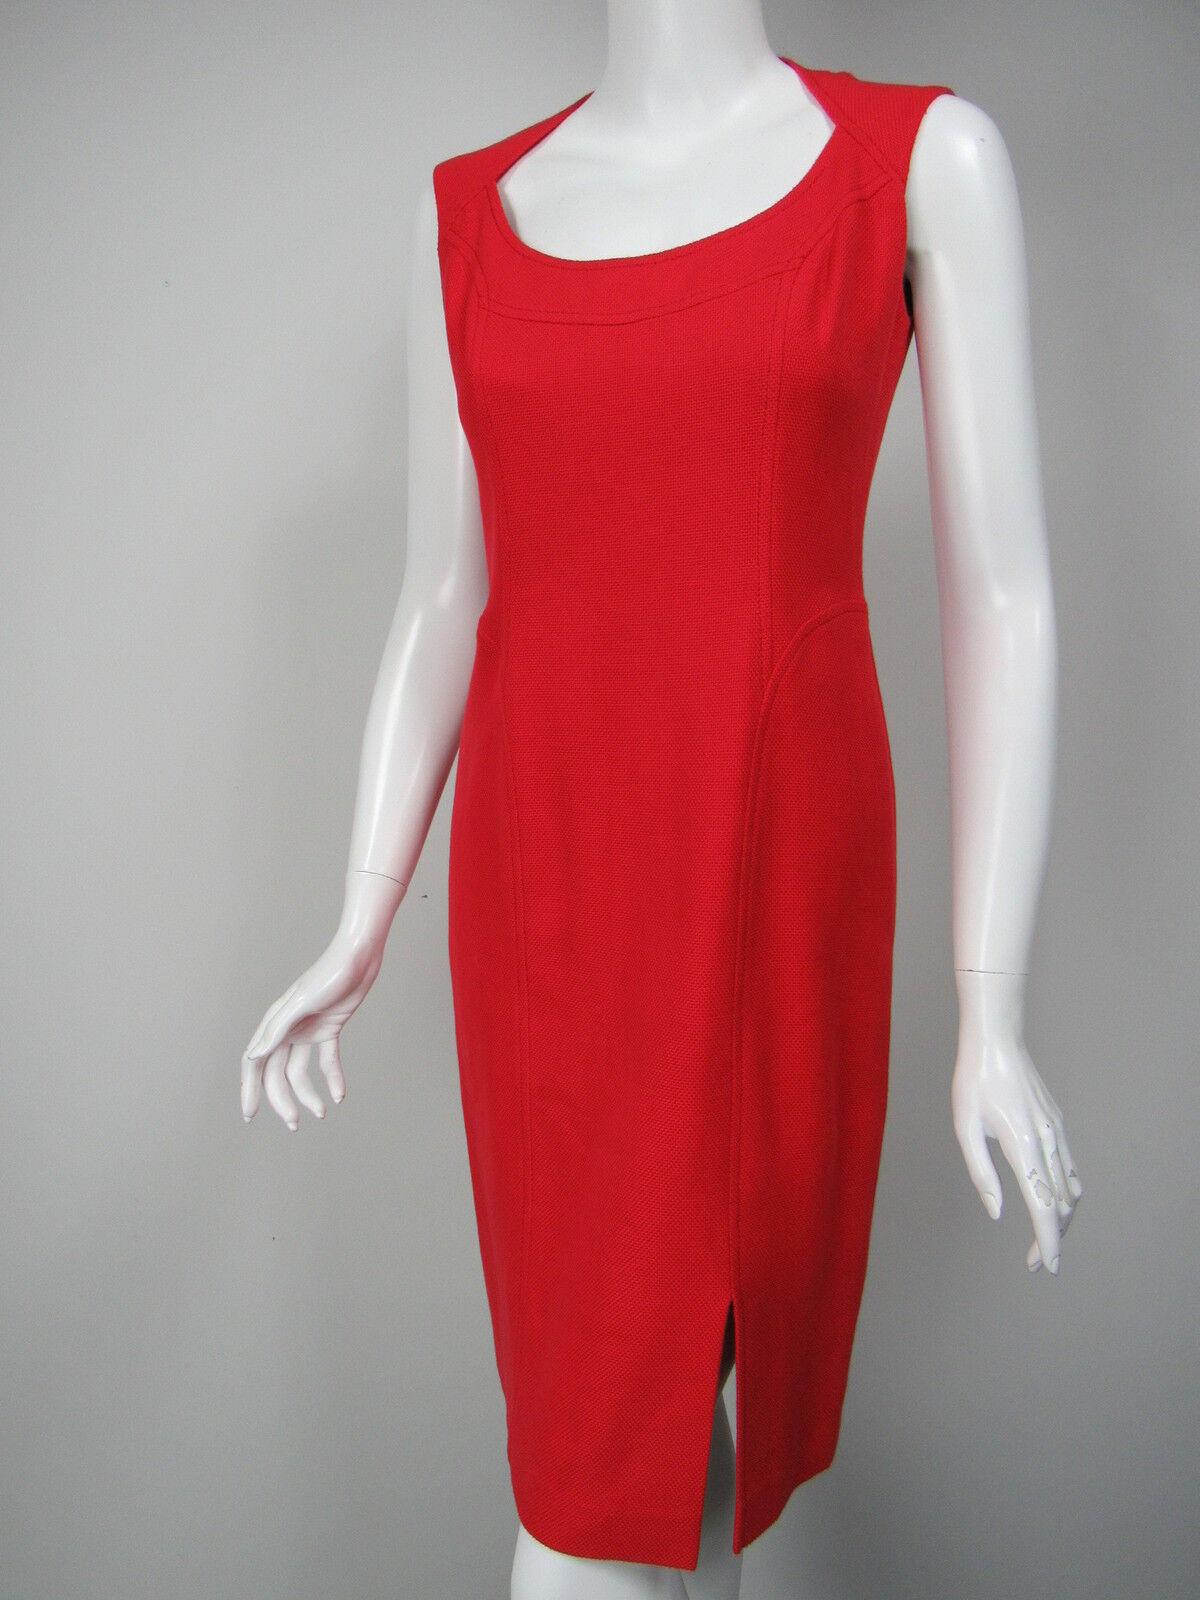 ESCADA Cherry rot Basketweave Cotton Scoop Neck Seam Detail Dress D 36 US 6